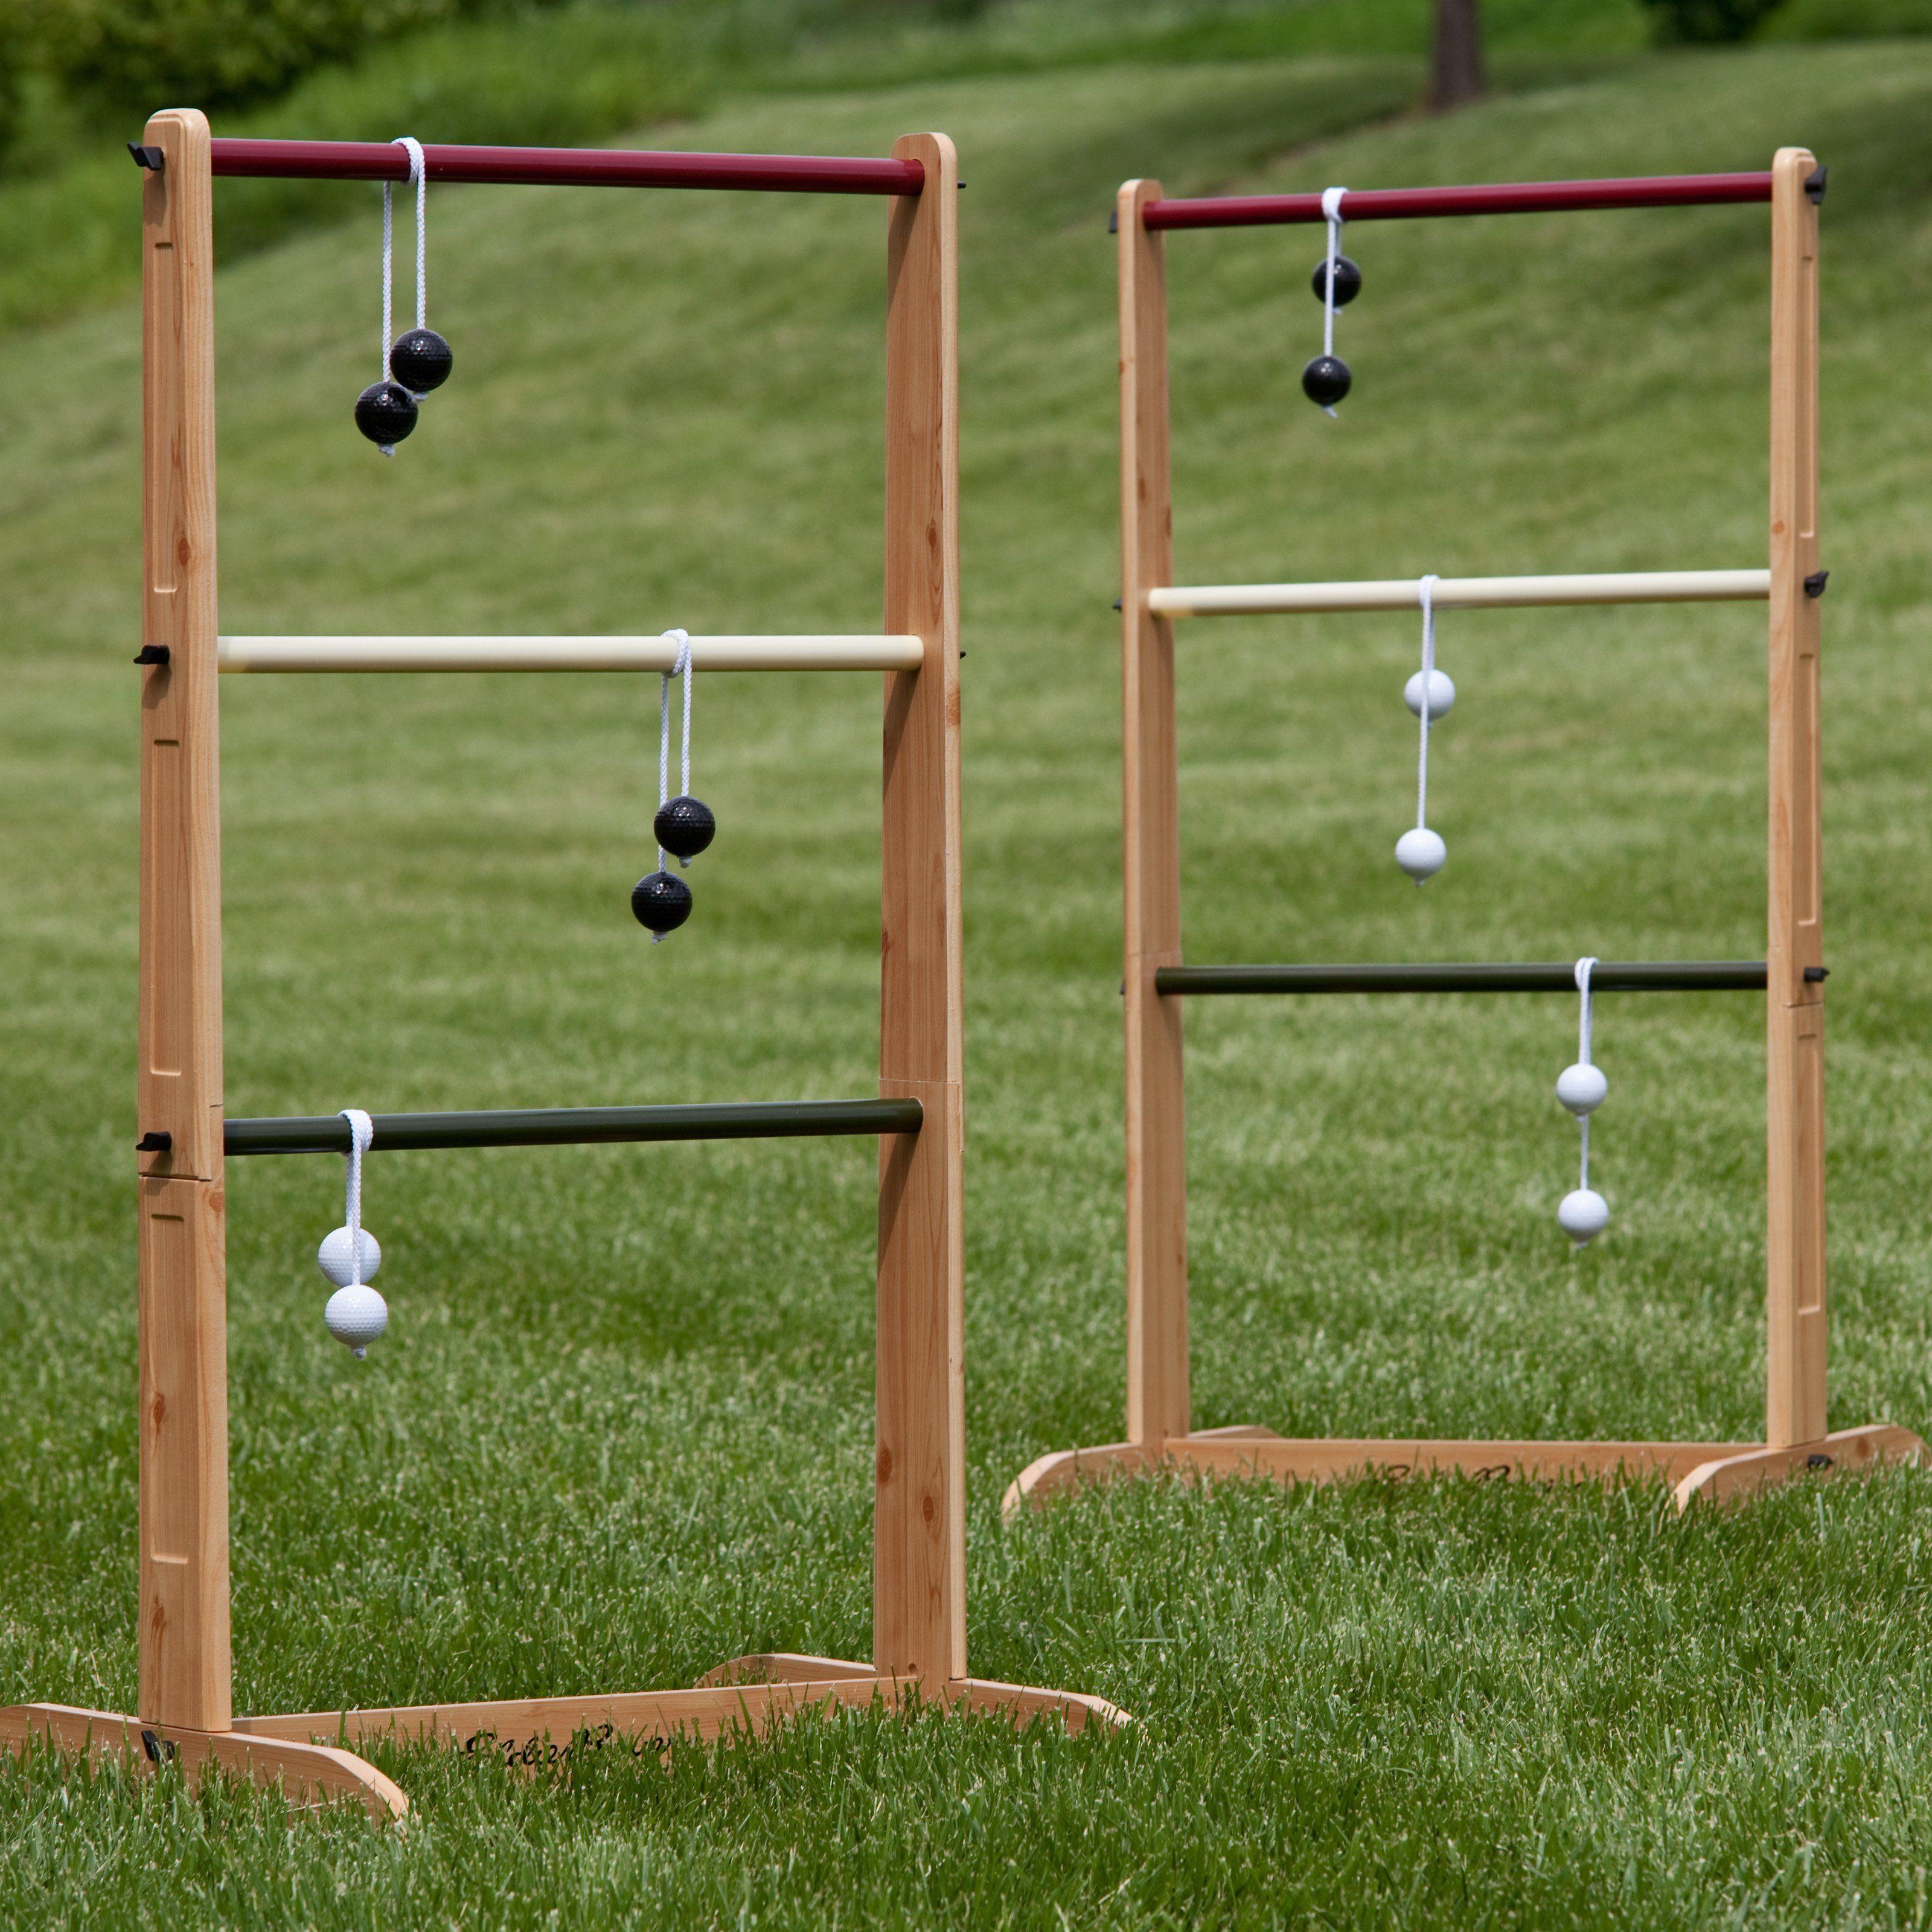 Eddie Bauer Ladder Ball Set Www Hayneedle Com Wedding Yard Games Lawn Games Lawn Games Wedding